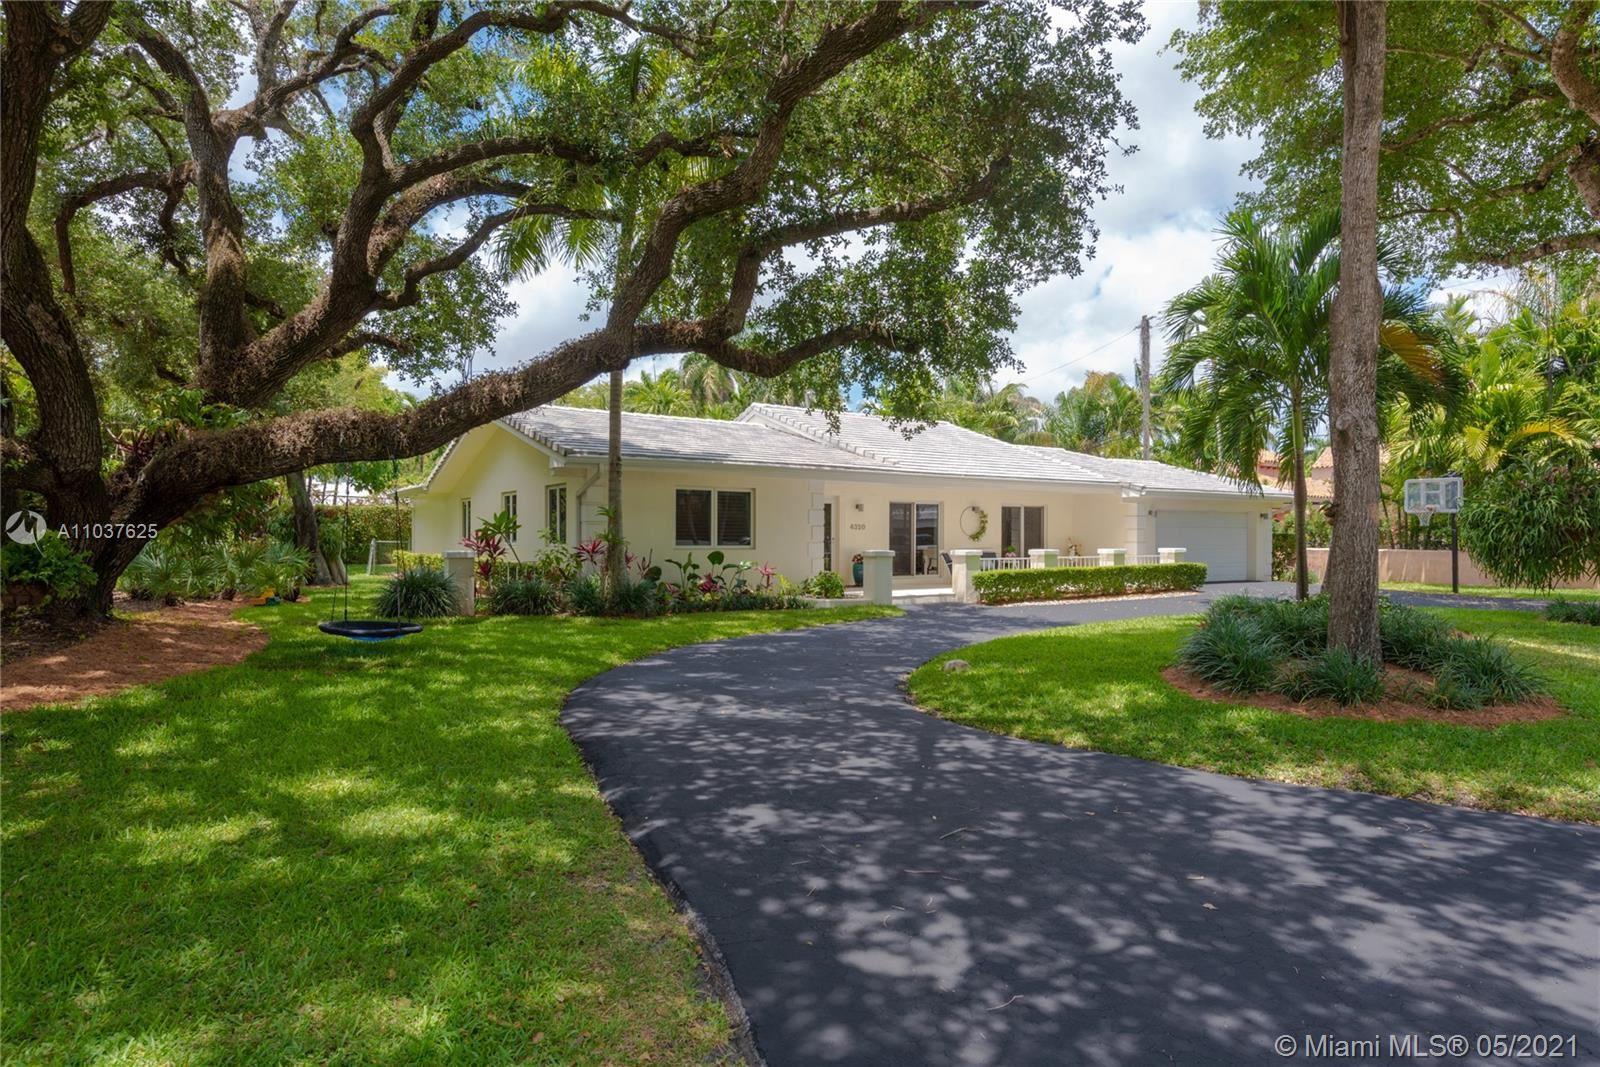 Photo of 4320 Palmarito St, Coral Gables, FL 33146 (MLS # A11037625)